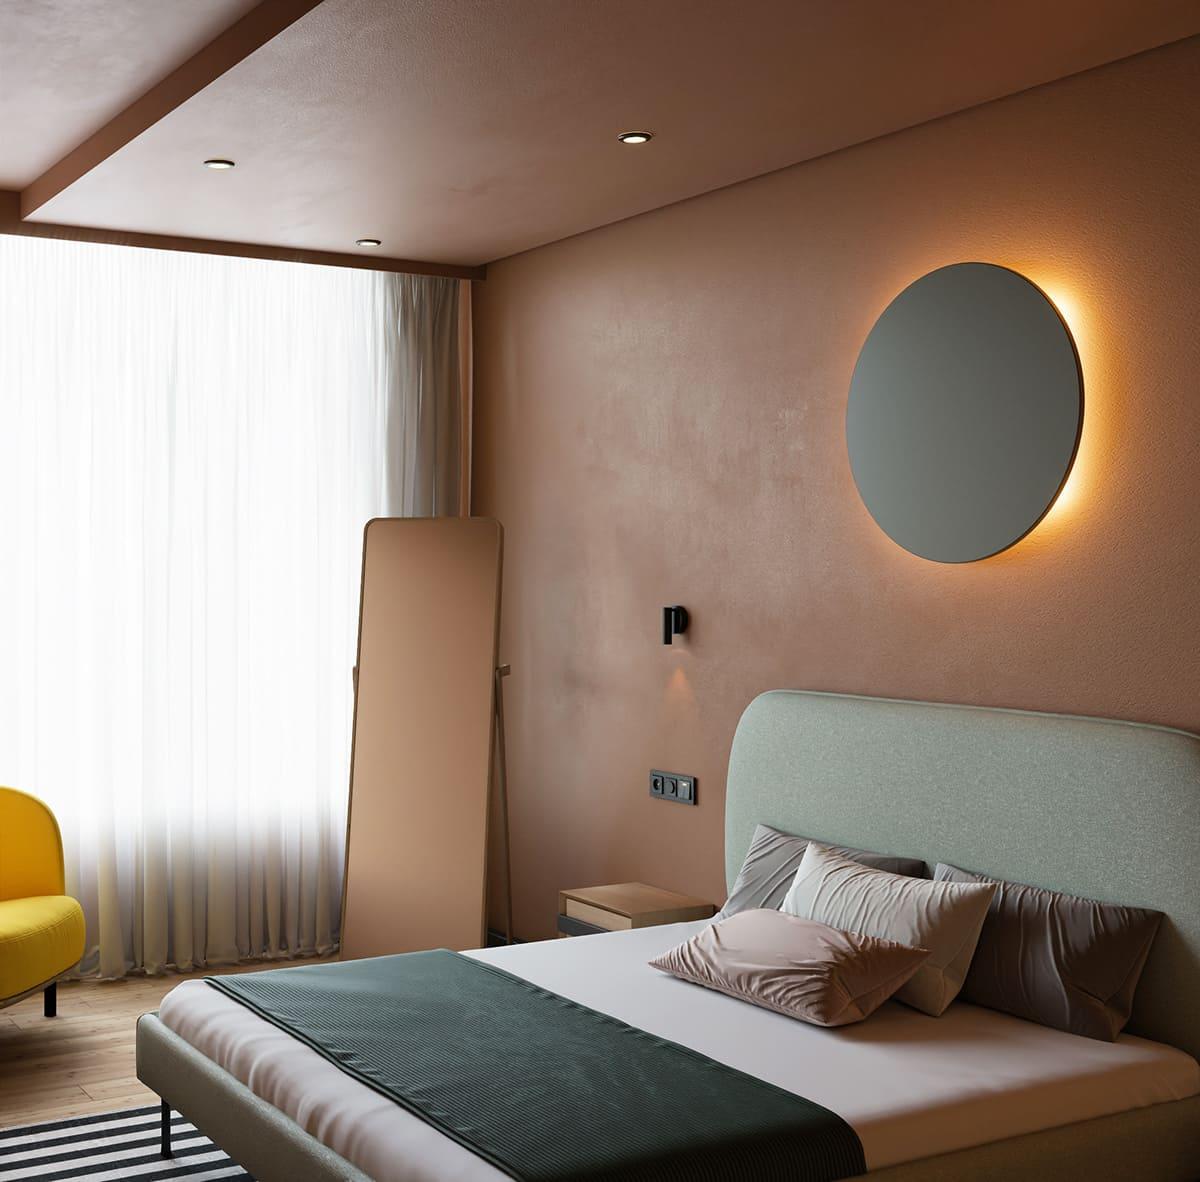 модный дизайн интерьера квартиры фото 25